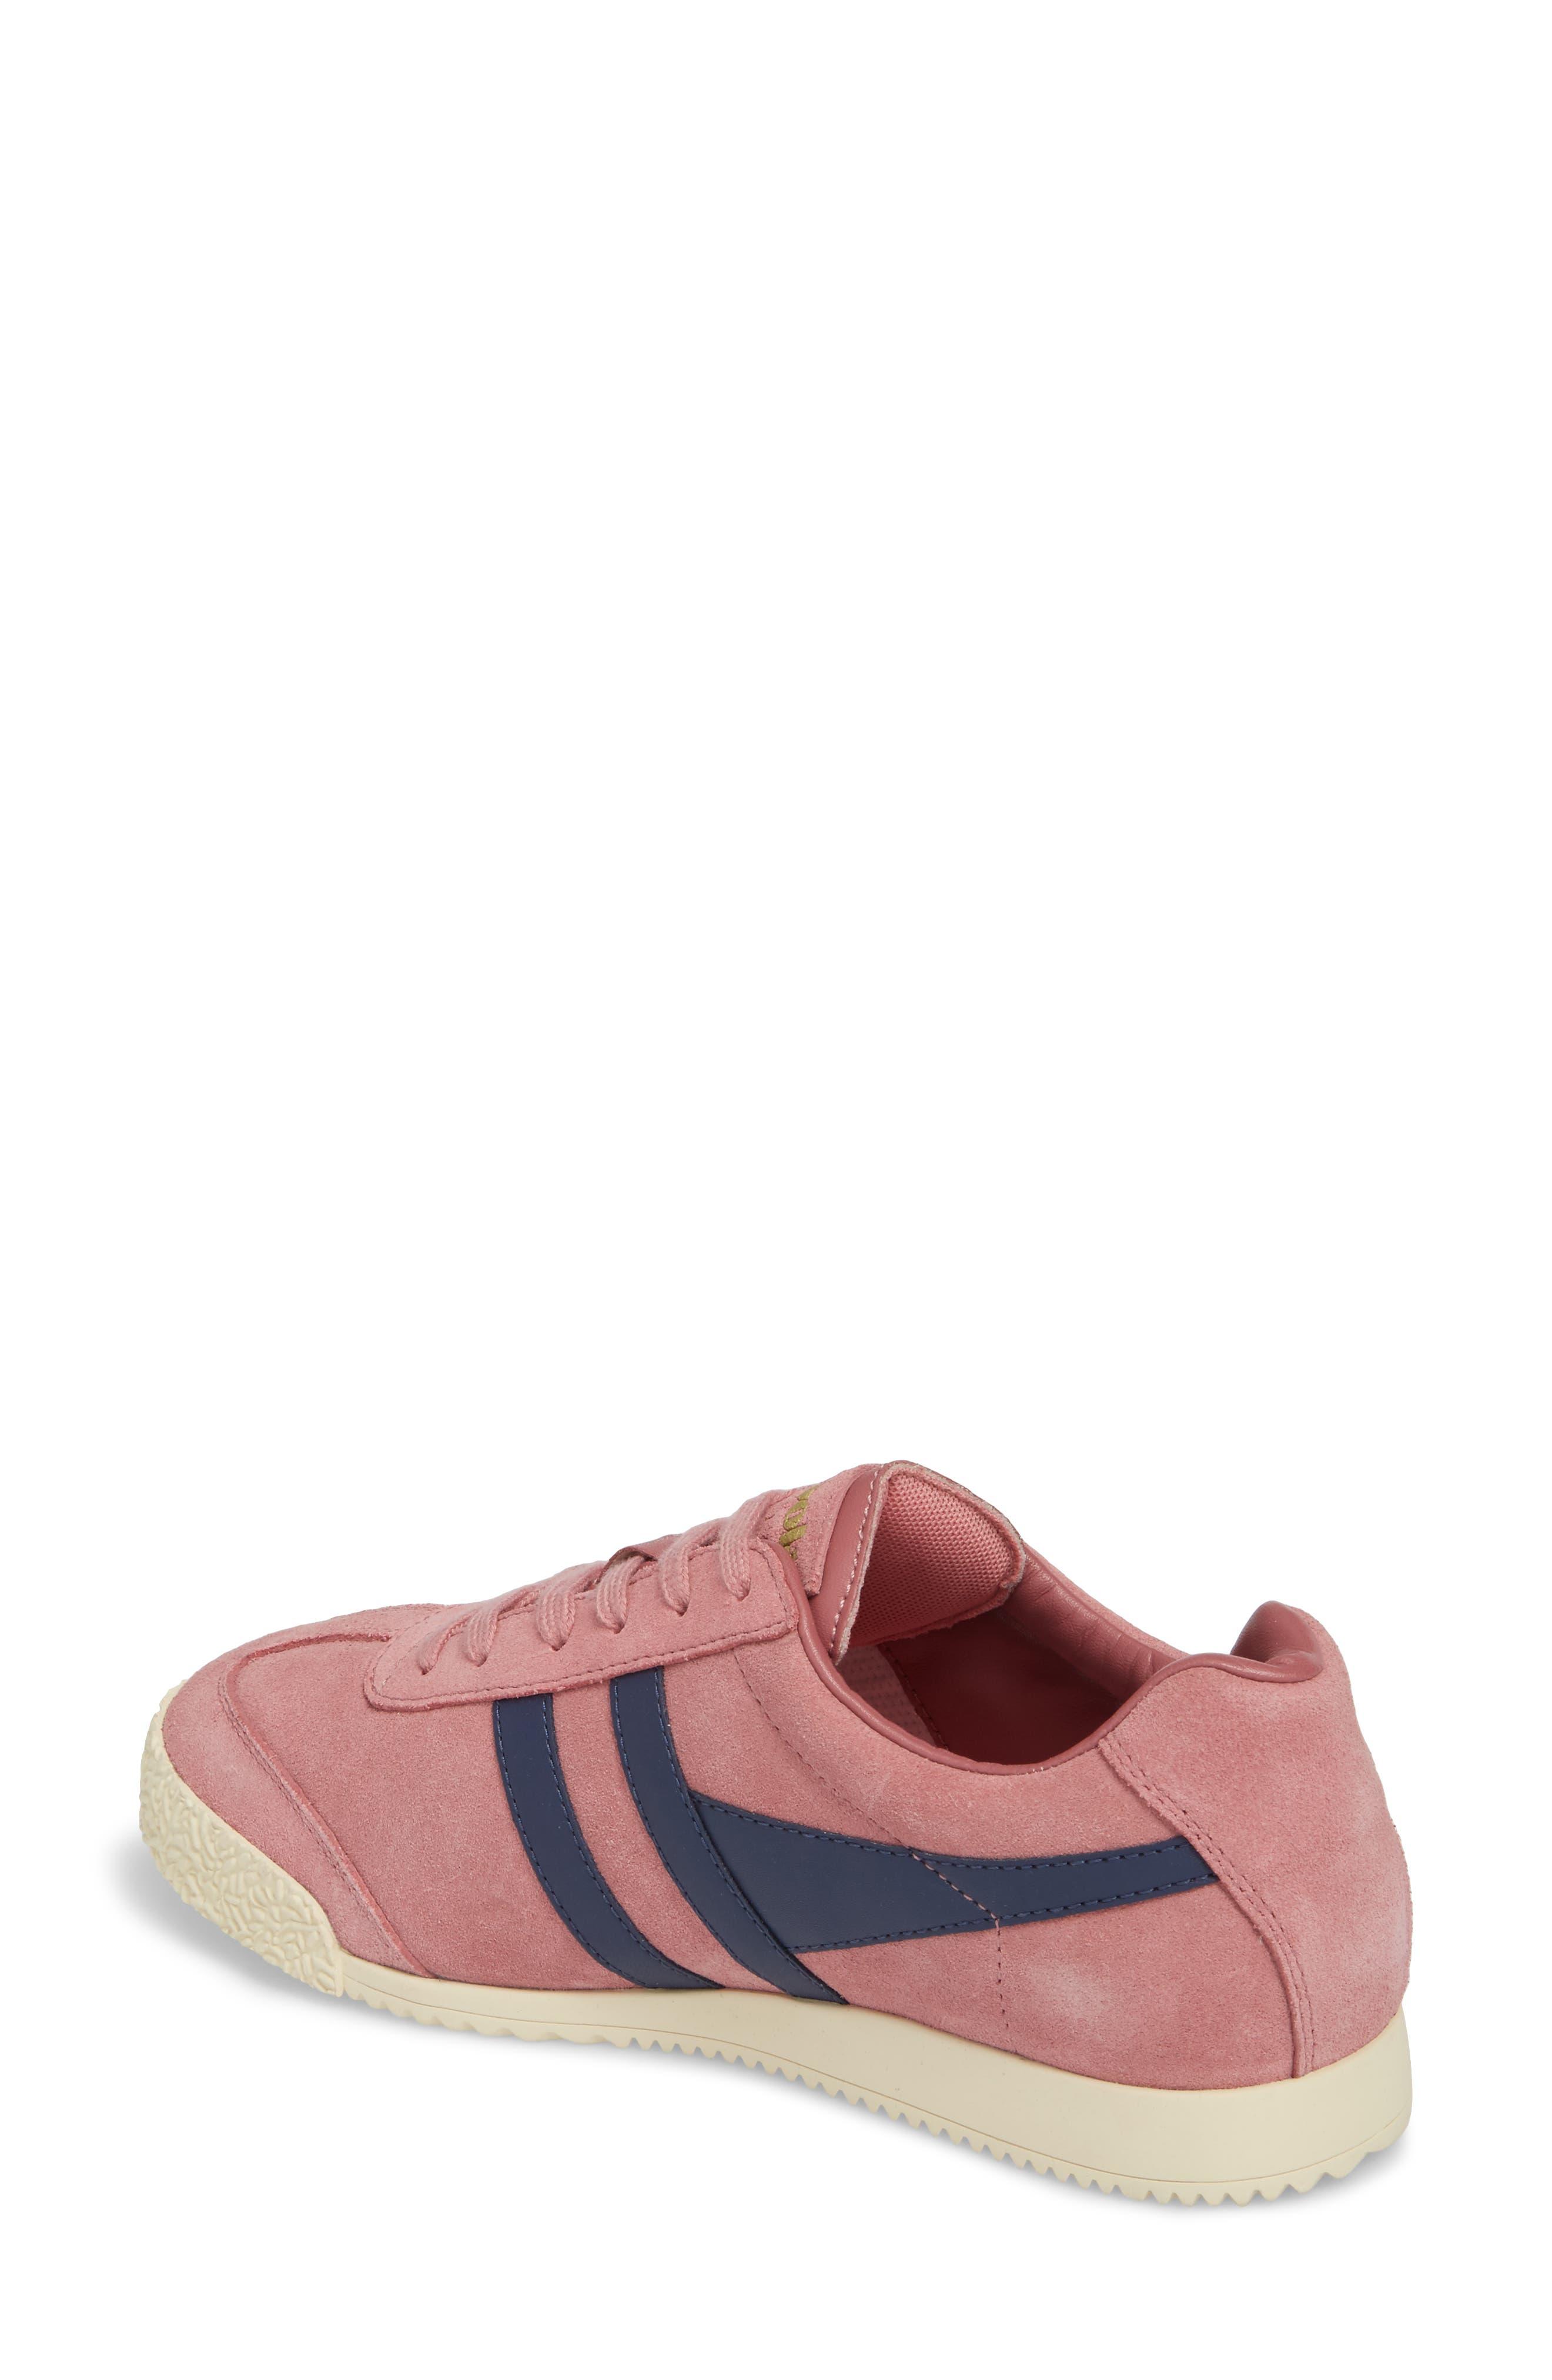 Harrier Suede Low Top Sneaker,                             Alternate thumbnail 2, color,                             Dusty Rose/ Navy